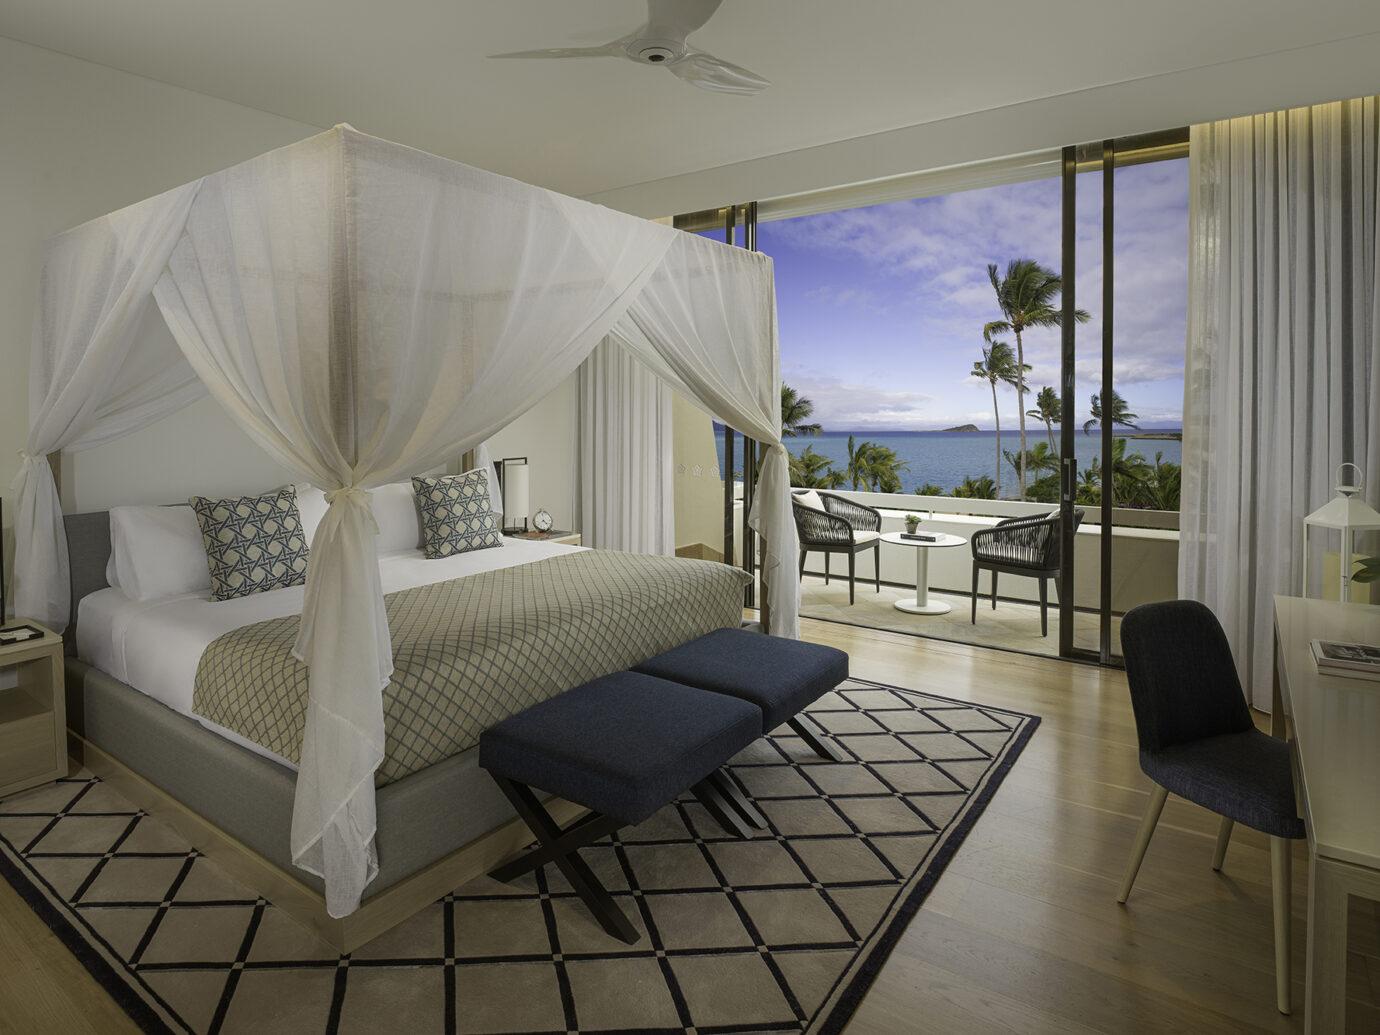 Bedroom at InterContinental Hayman Island Resort